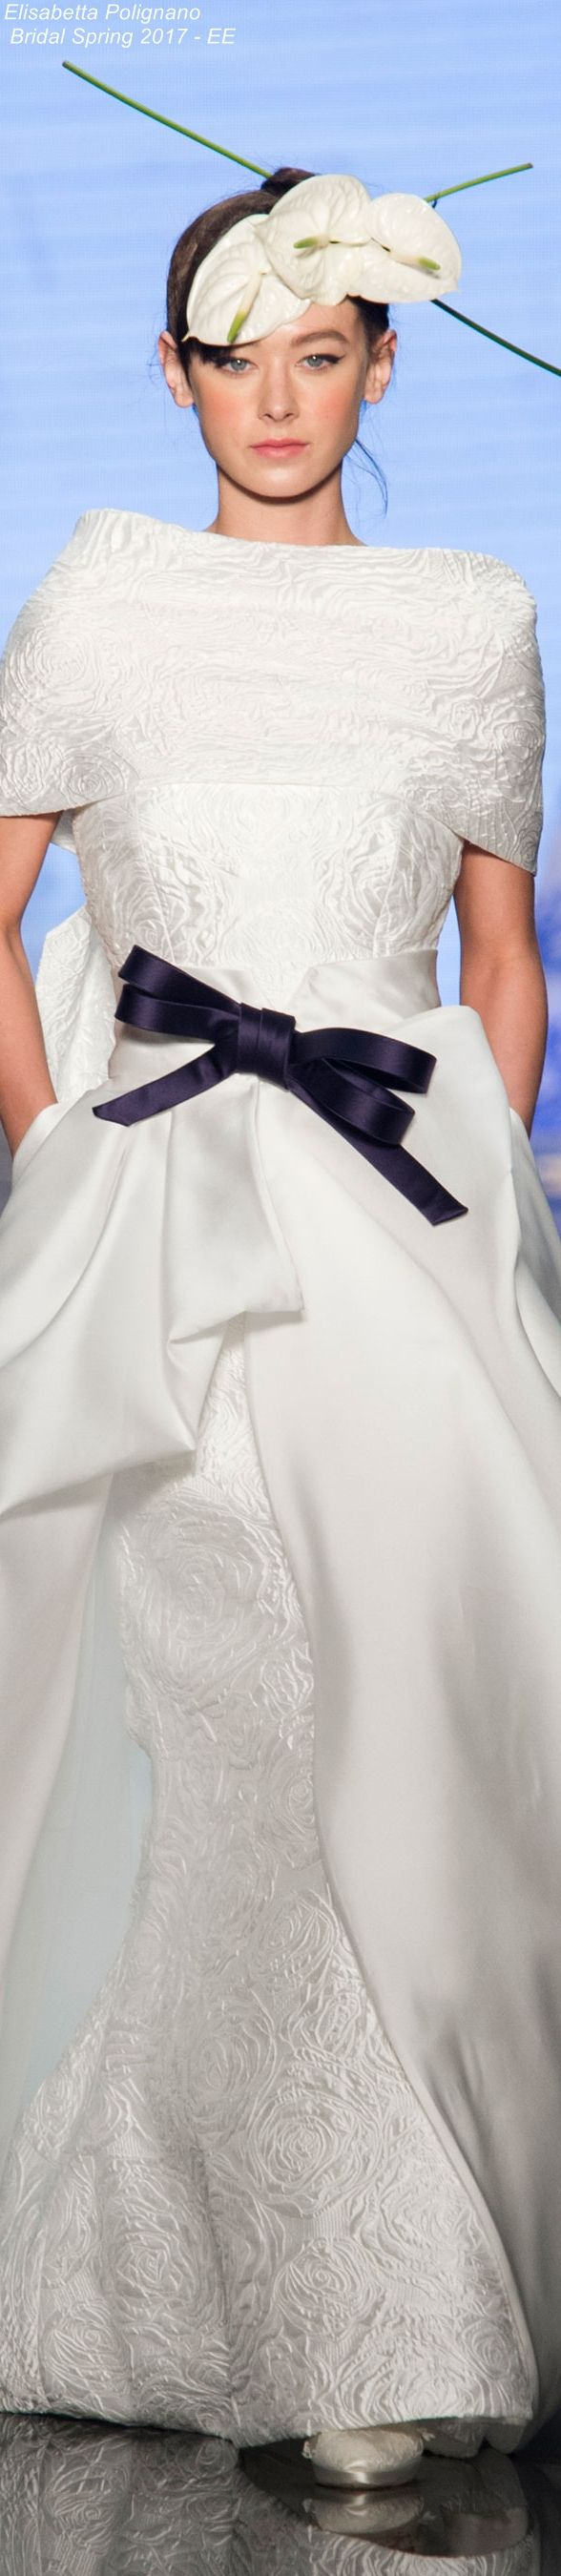 Elisabetta Polignano  Bridal Spring 2017 - E